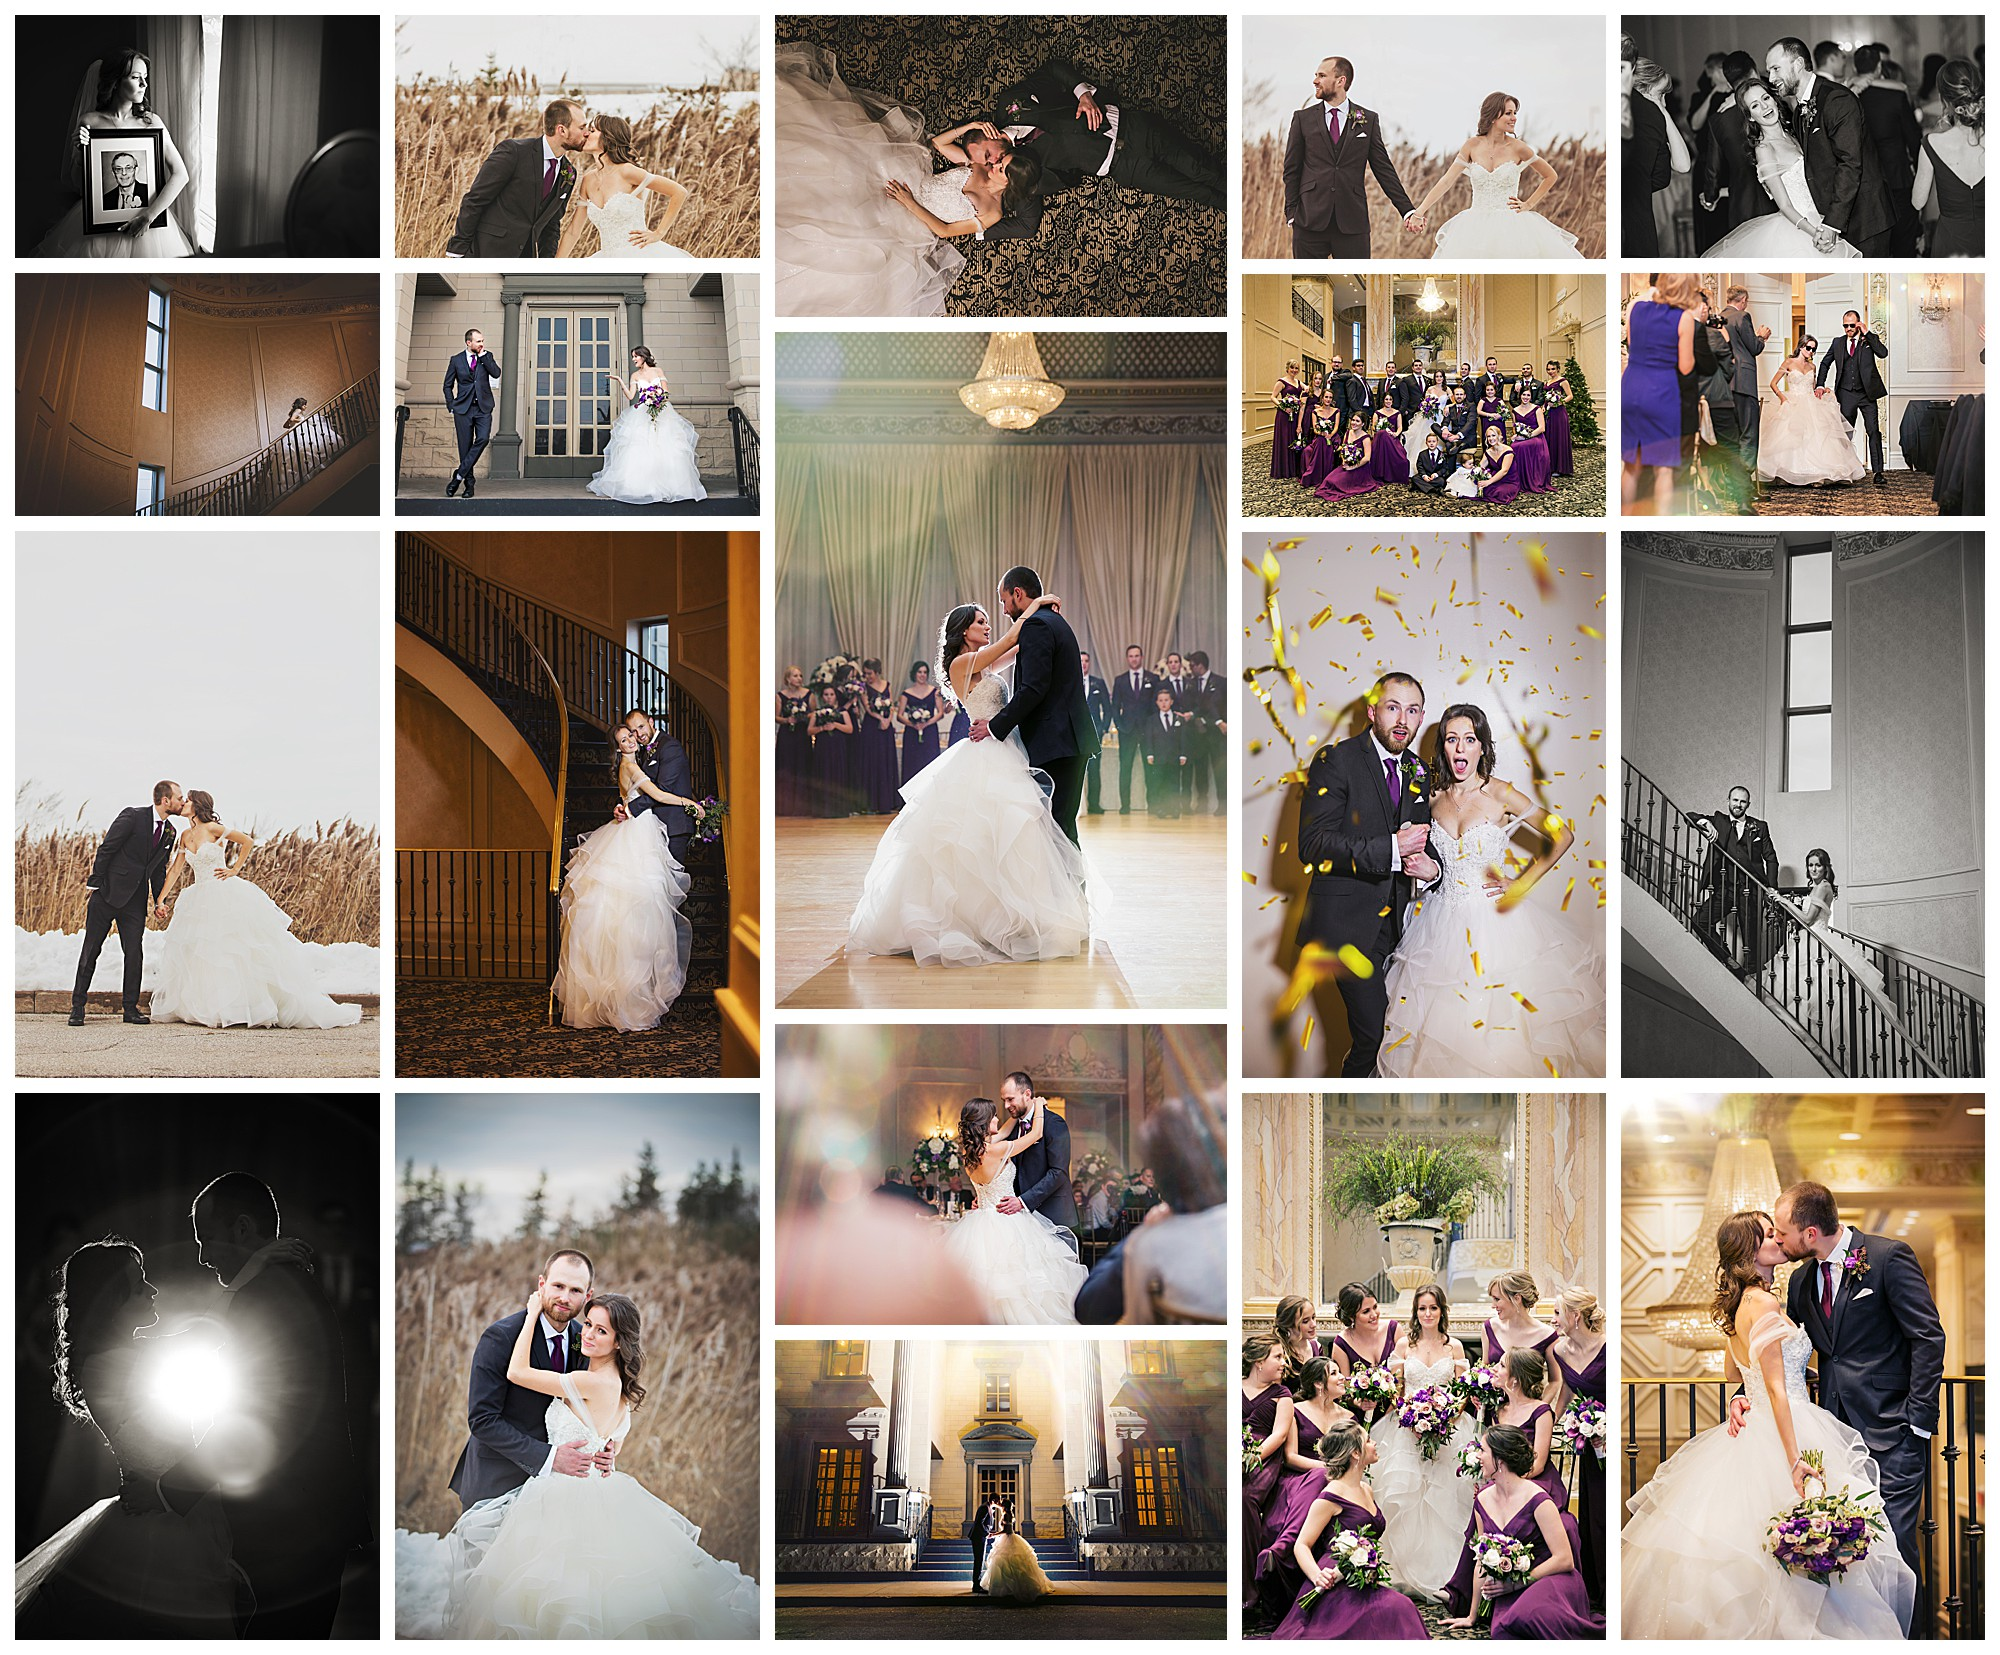 Chateau LeJardin, Woodbridge, Ontario wedding photography by VanDaele & Russell